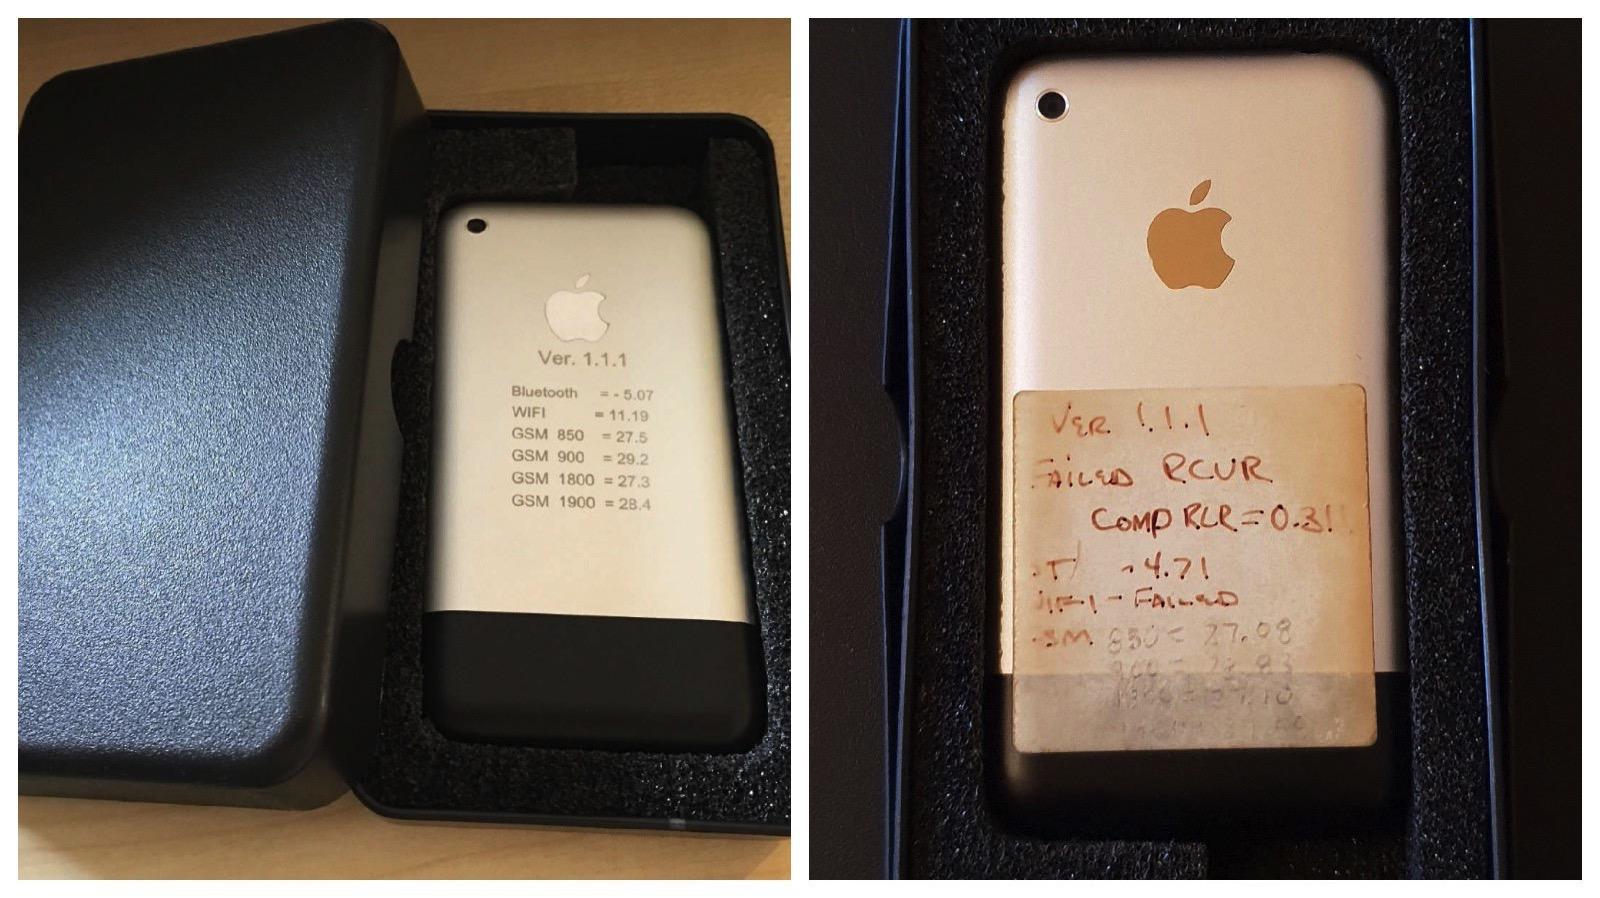 Original-iPhone-Prototypes-on-eBay.jpg